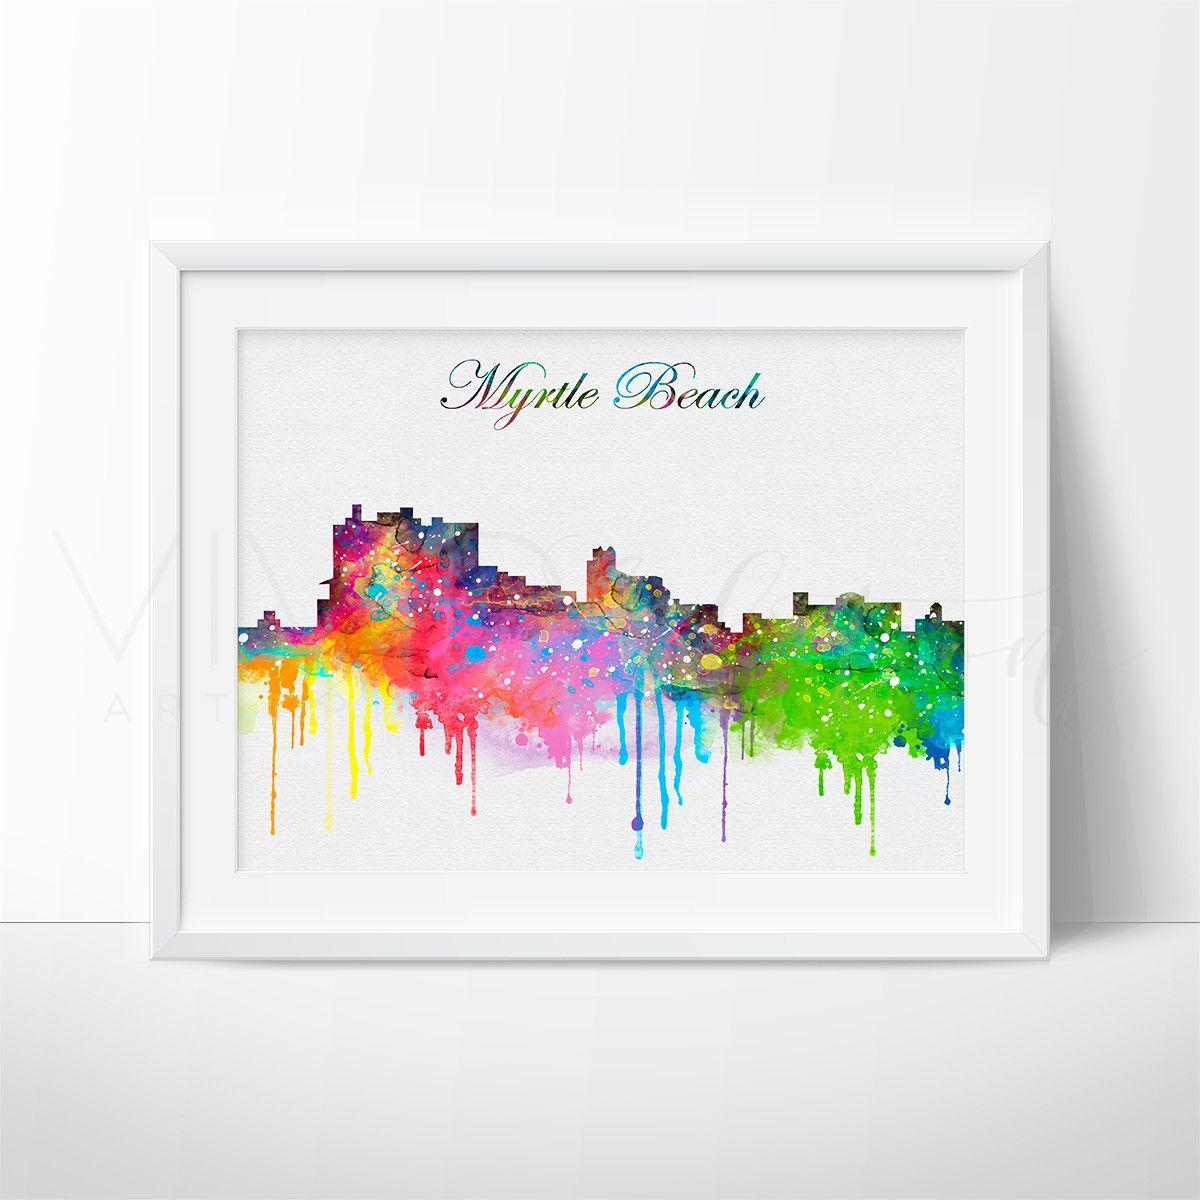 Myrtle Beach Skyline Cityscape Watercolor Art Print Wall Decor